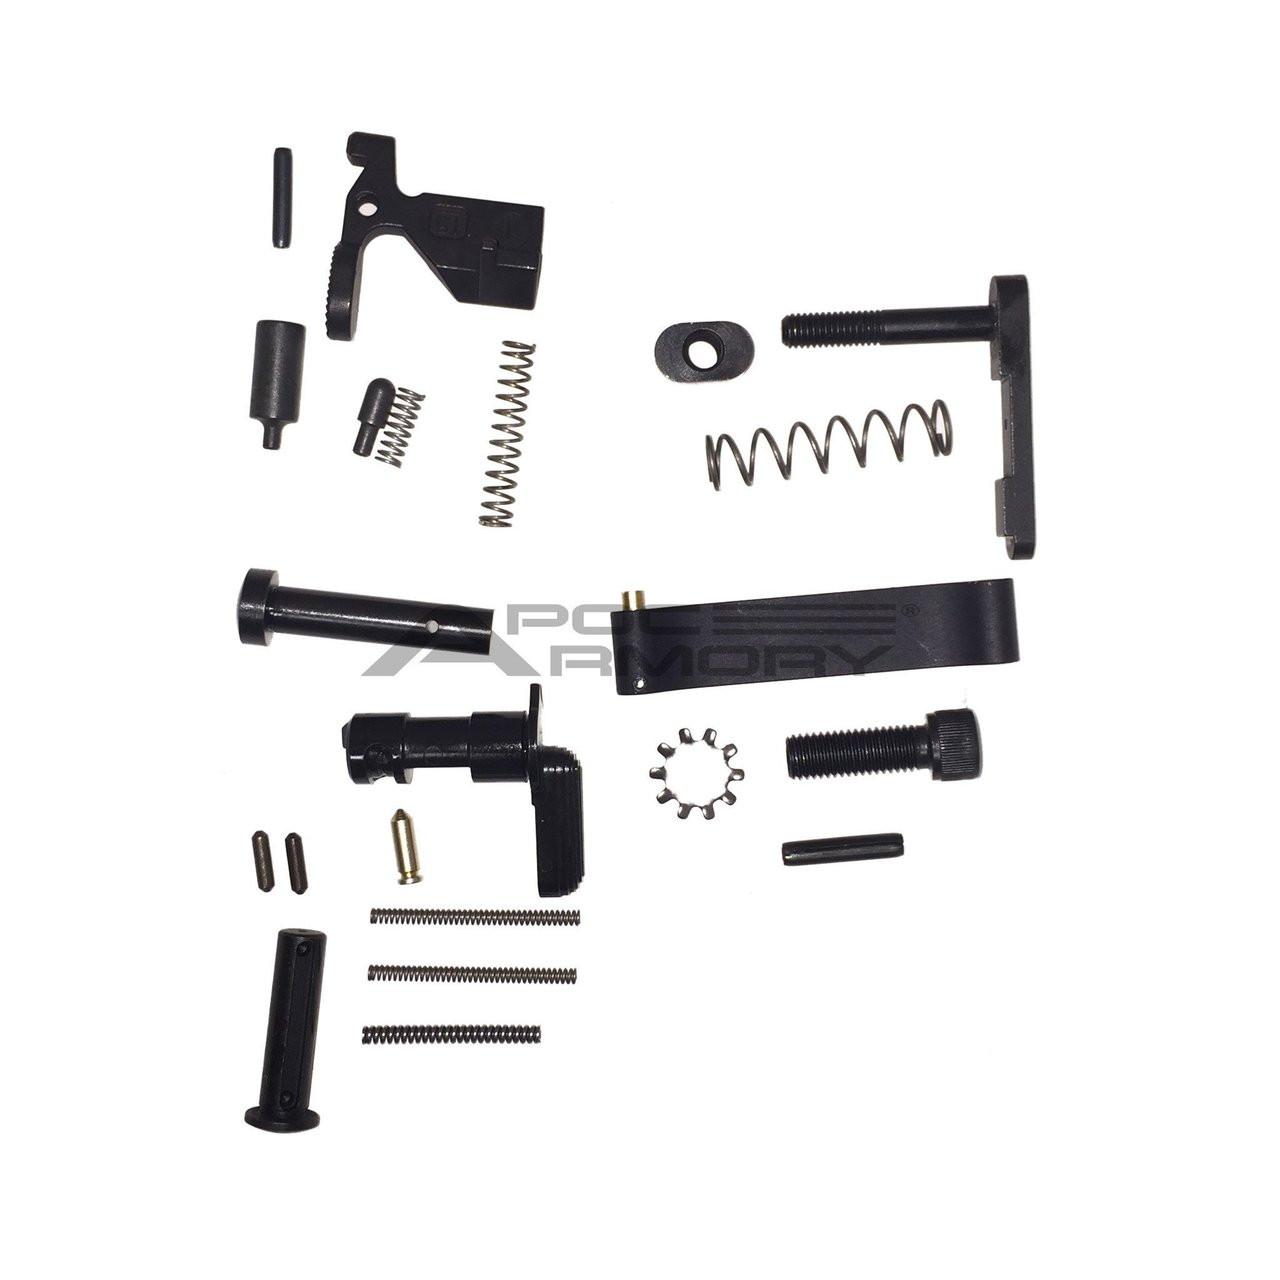 Lower Parts Kit minus Fire Control Group & Grip